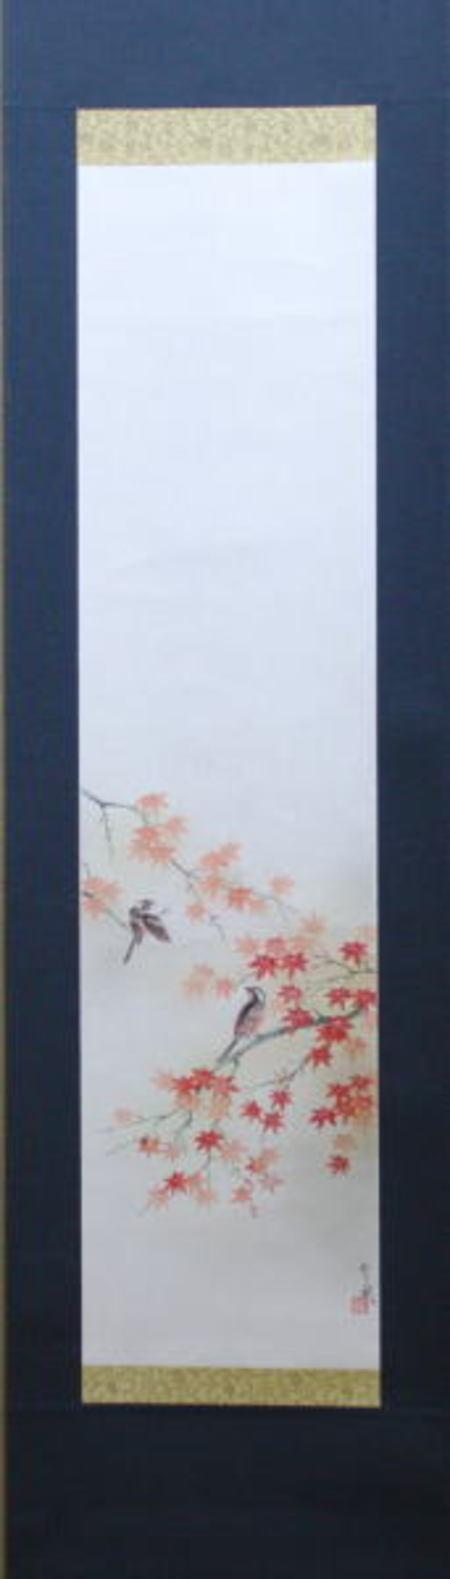 【茶器/茶道具 掛軸(掛け軸)】 一行自画賛 風帯なし 紅葉に小鳥の画 曽根幸風画(肉筆画)